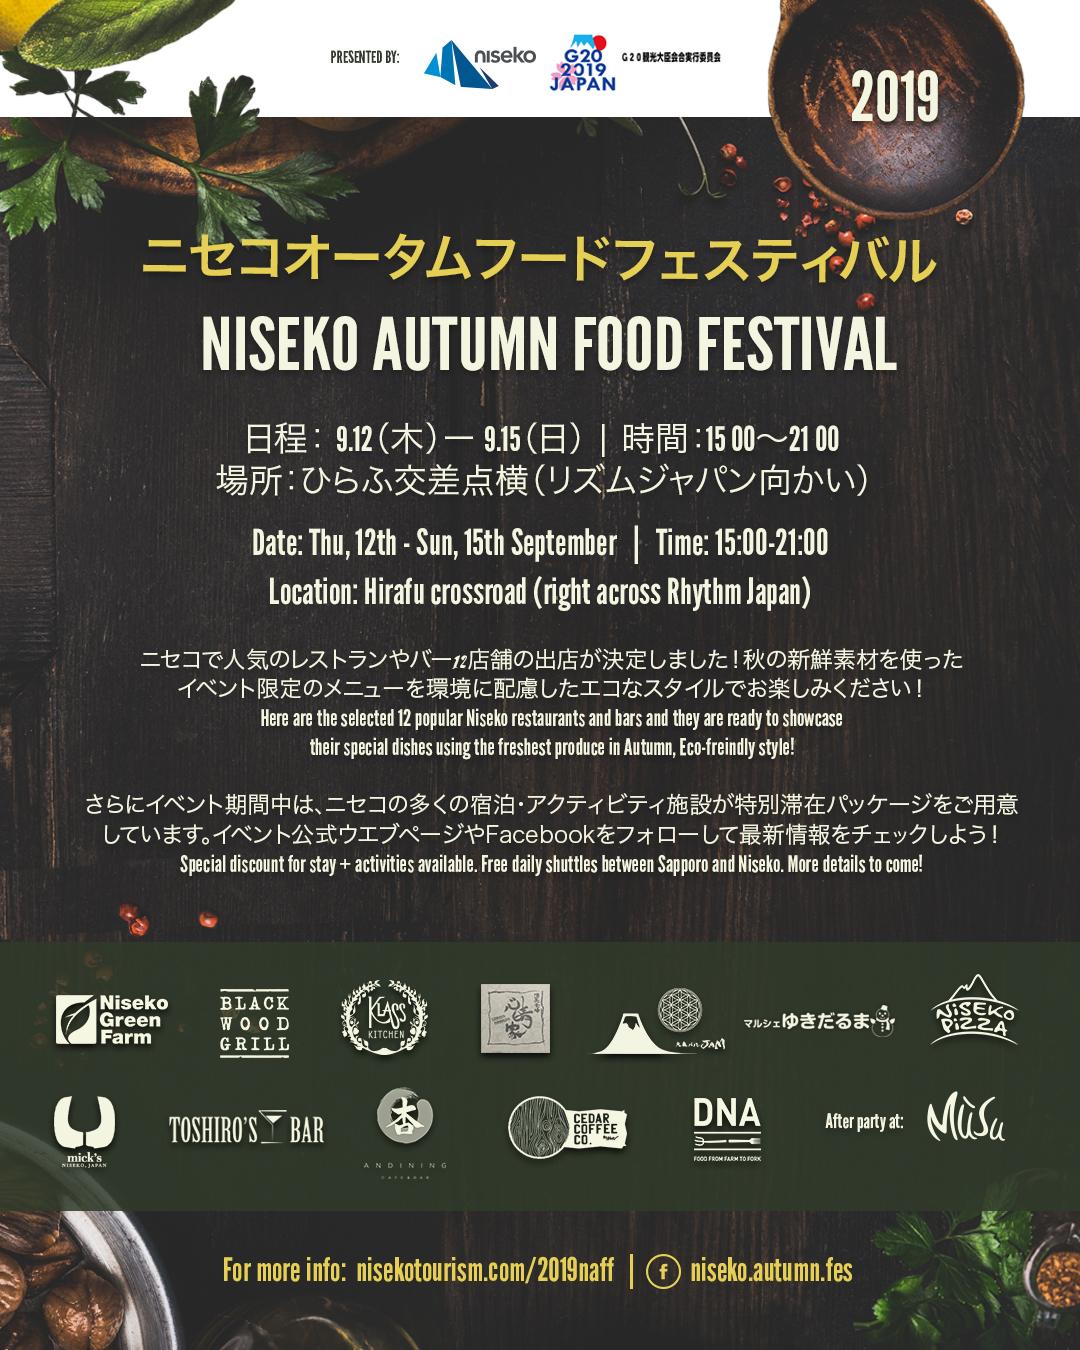 2019 Niseko Autumn Food Festival Poster